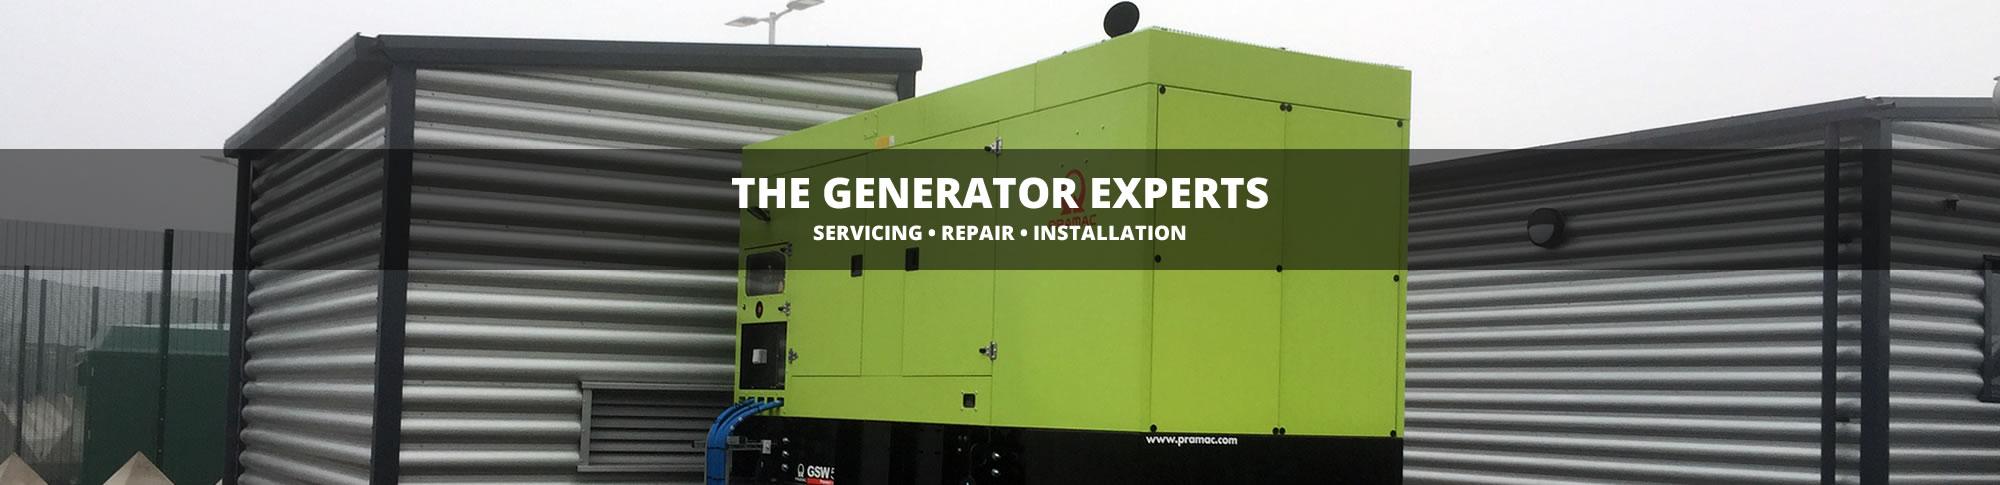 The Generator Experts, Servicing, Repair, Installation